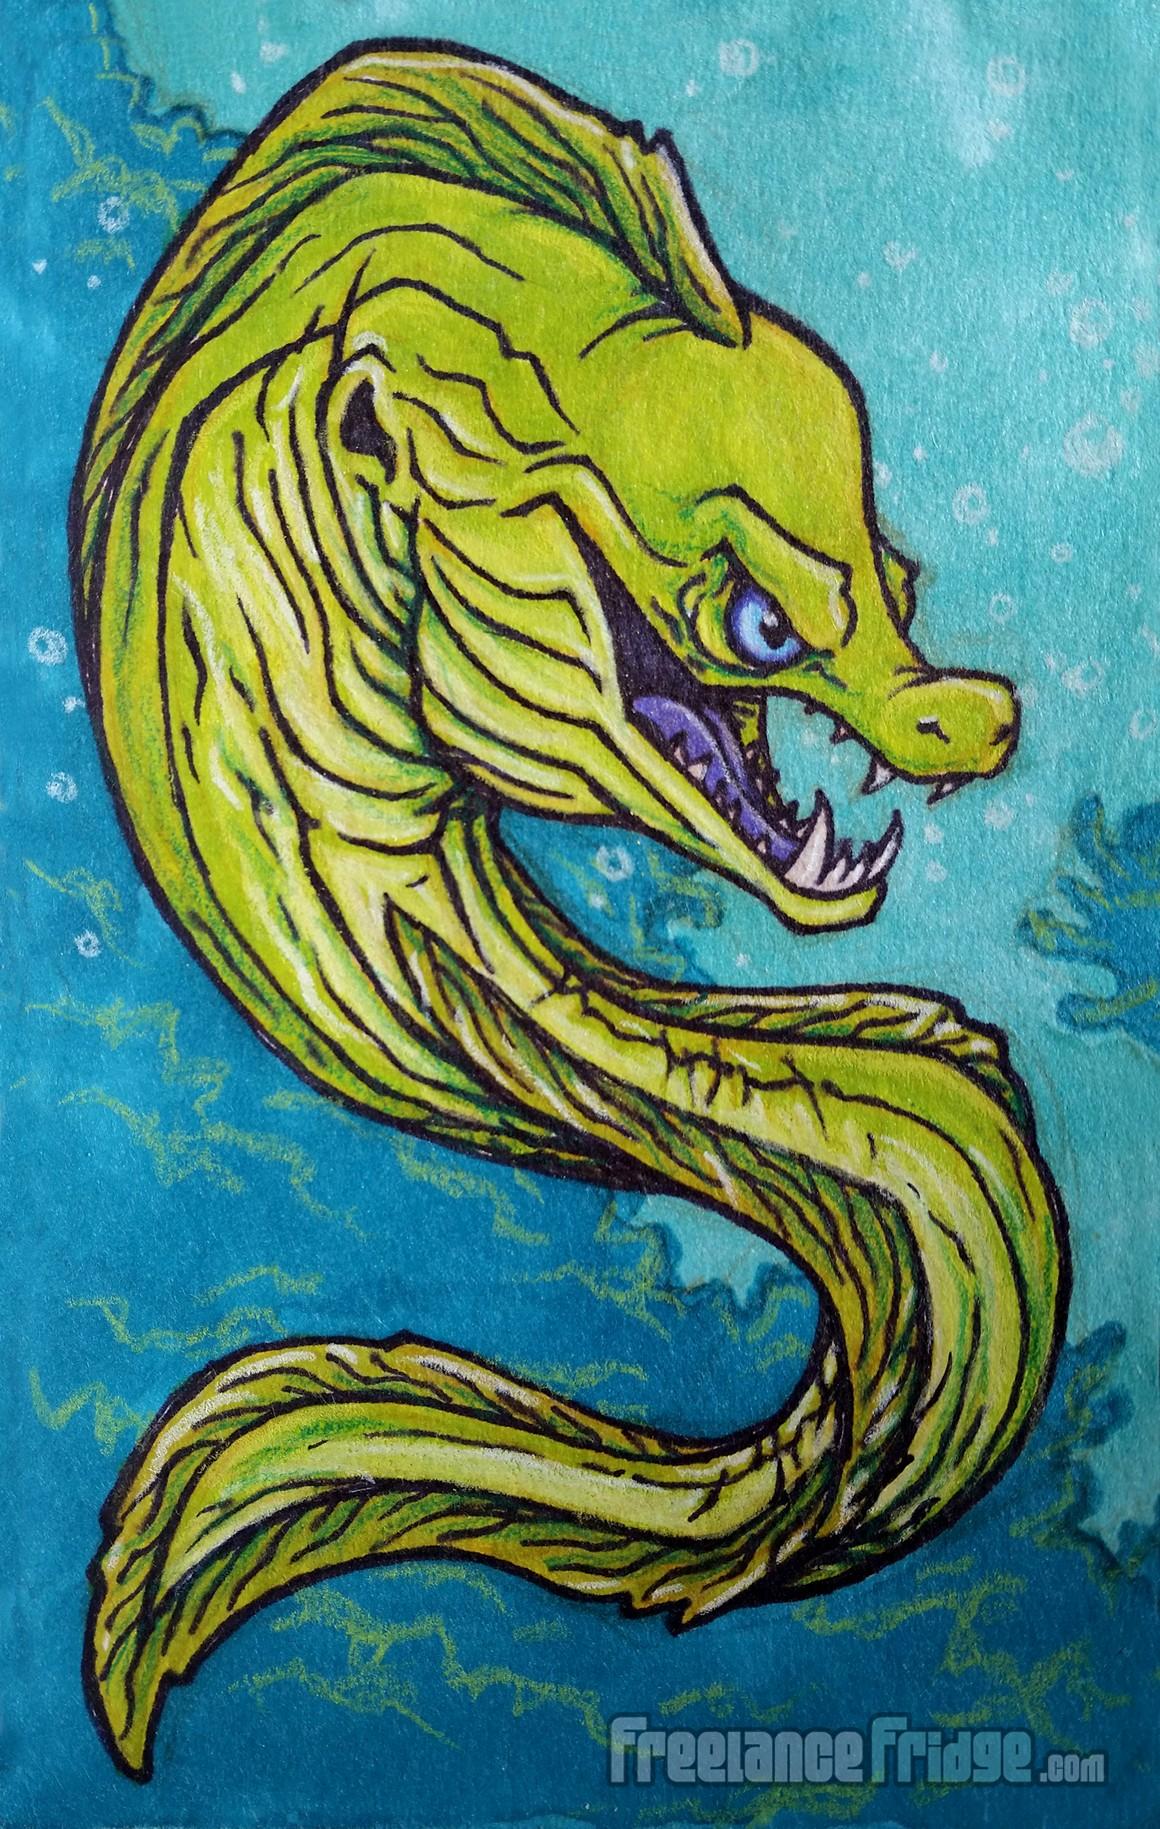 1160x1829 Moray Eel Cartoon Illustration Freelance Fridge Illustration